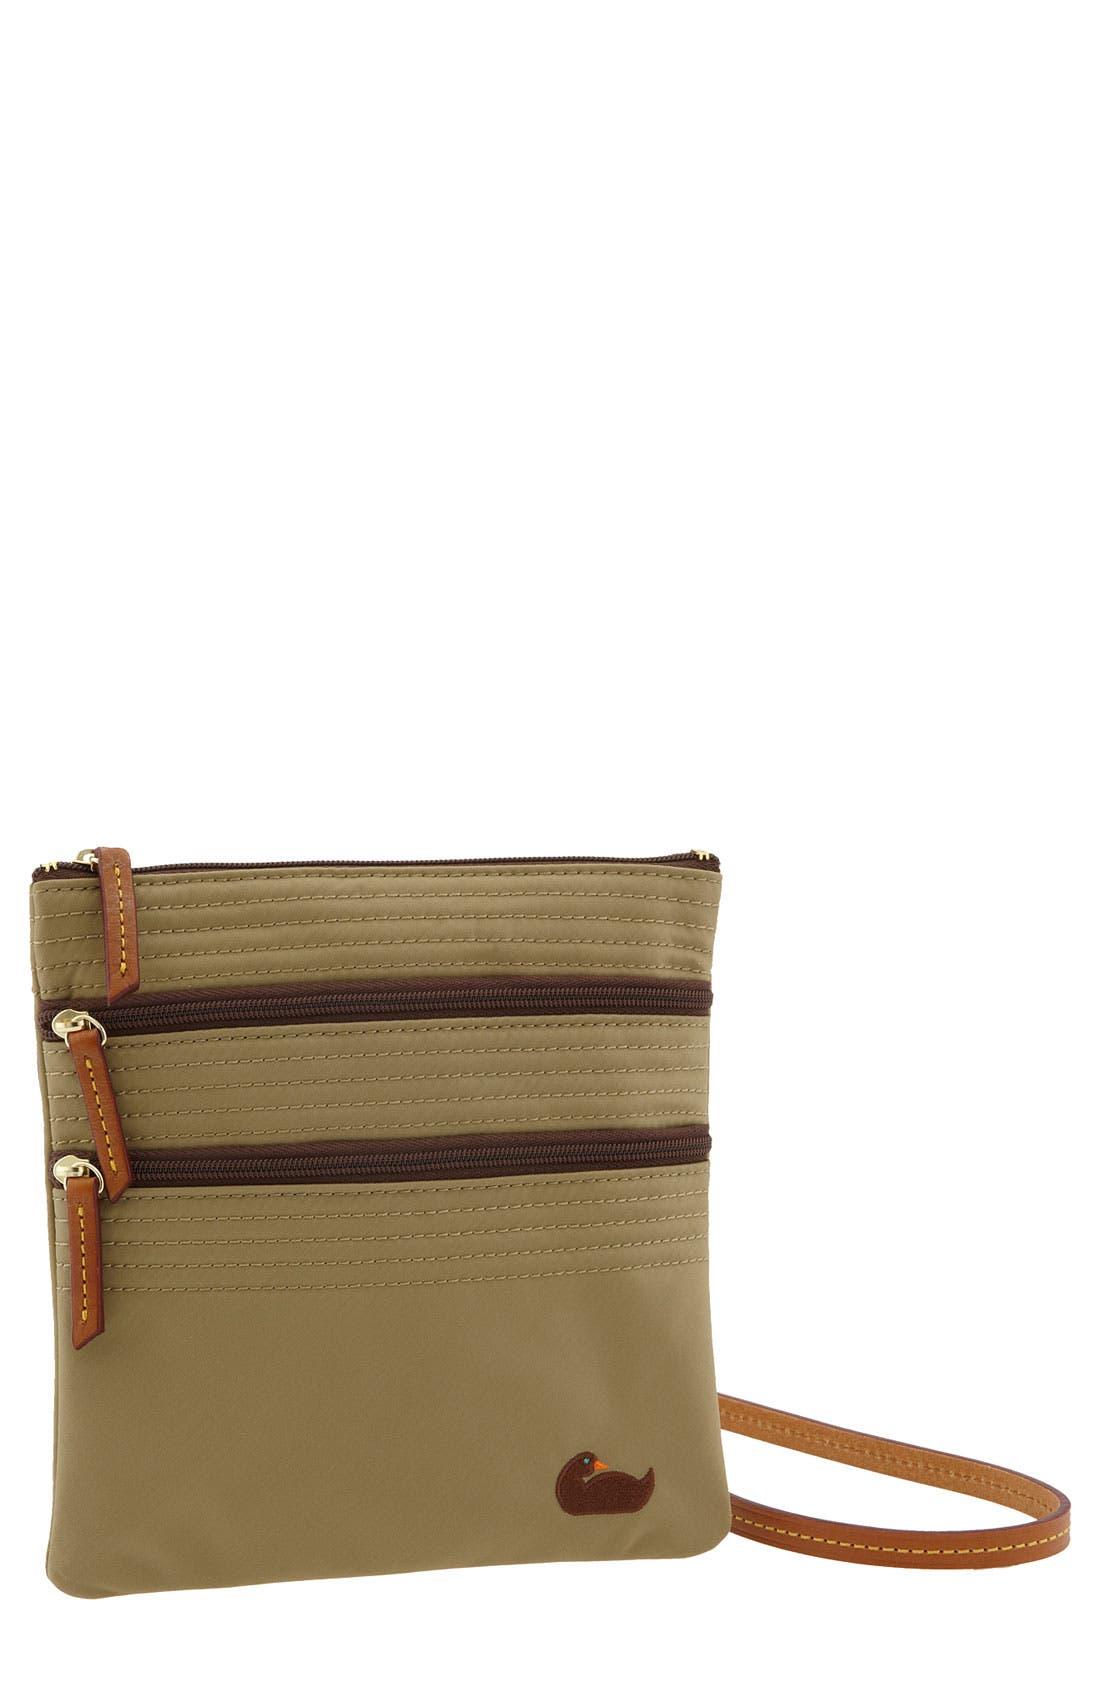 Alternate Image 1 Selected - Dooney & Bourke 'Triple Zip' Nylon Crossbody Bag